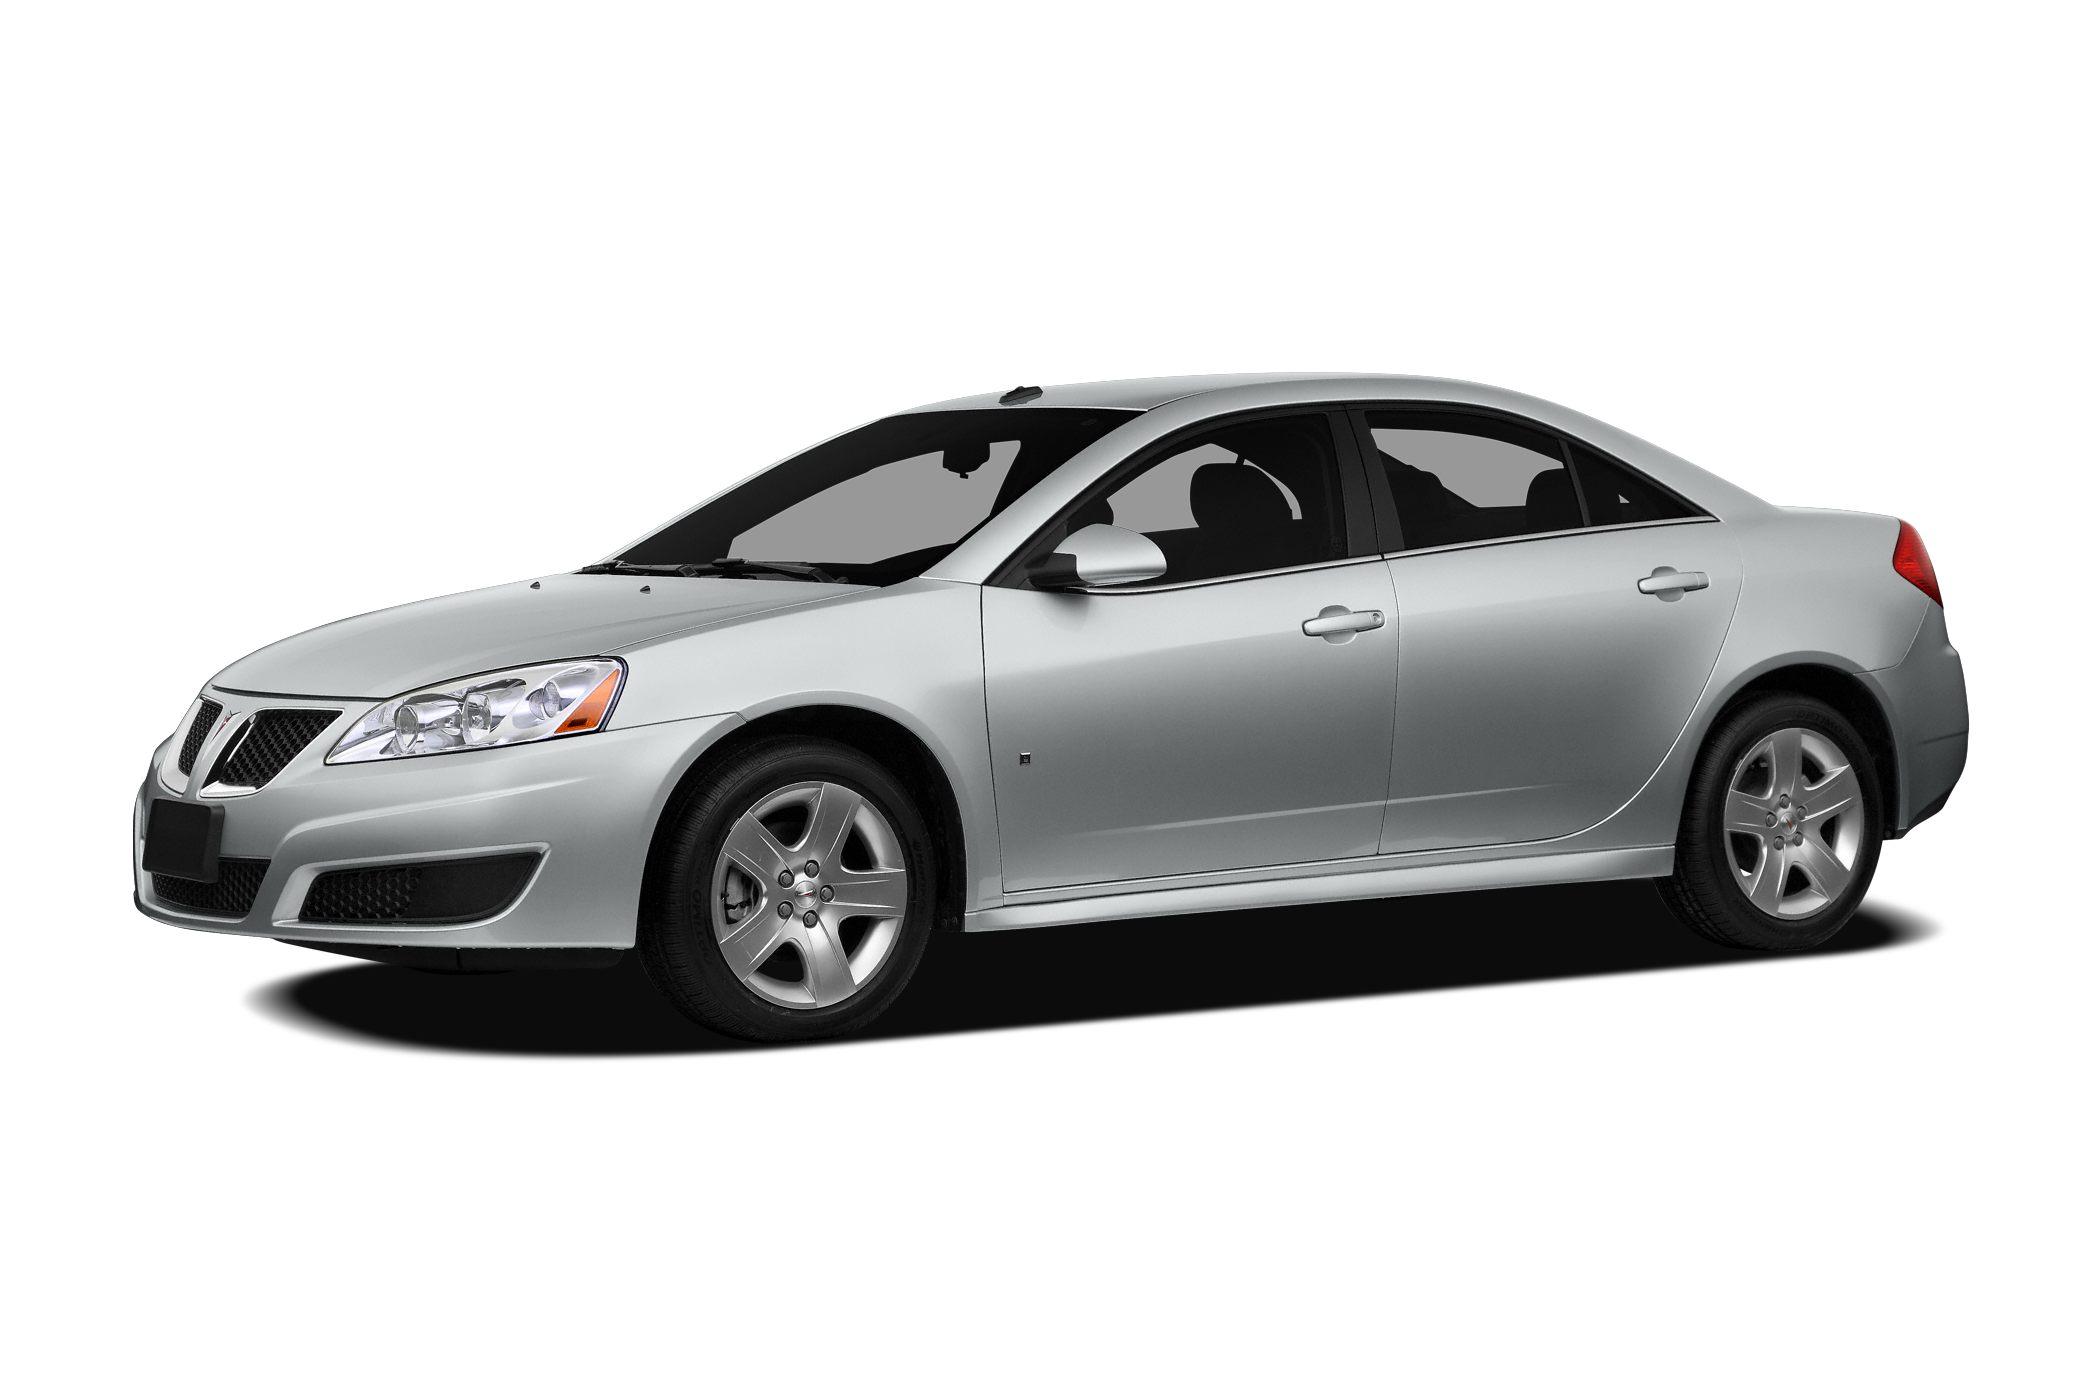 2009 Pontiac G6  Miles 77389Color Blue Stock 18067 VIN 1G2ZJ57B694257540